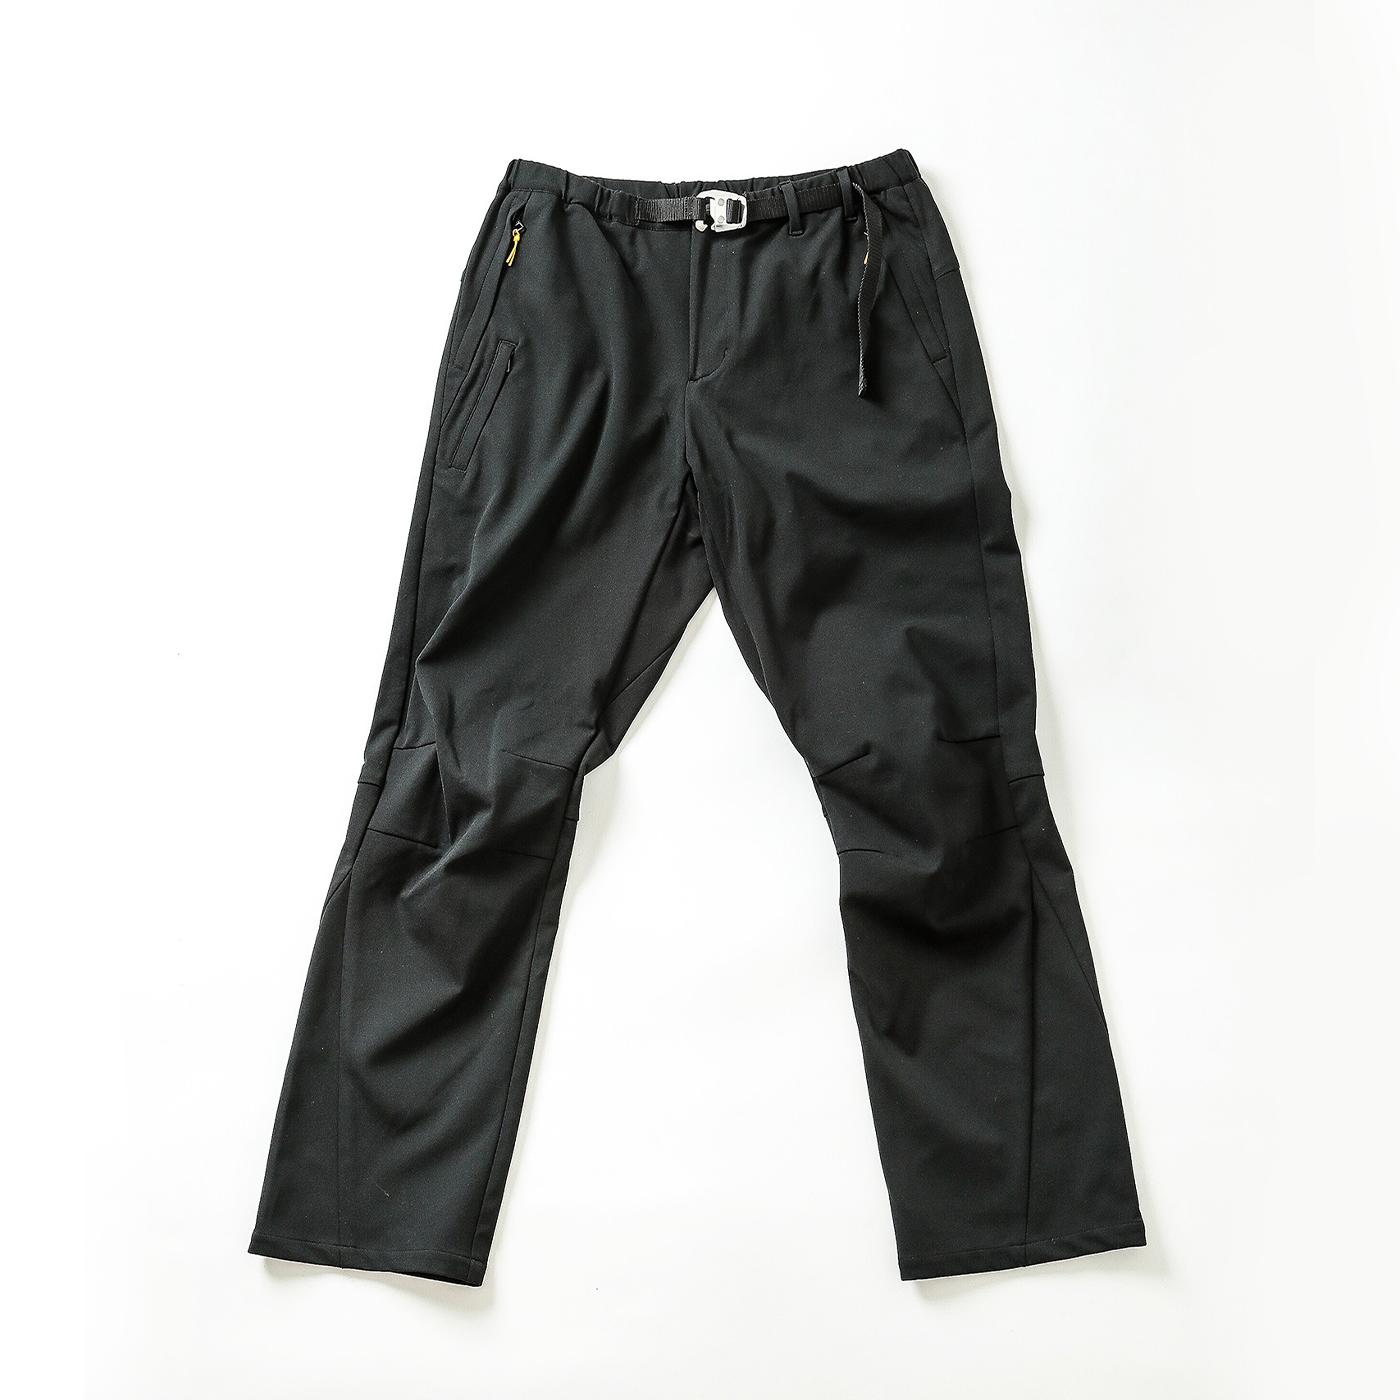 product: Alamosa / color: BLACK 1